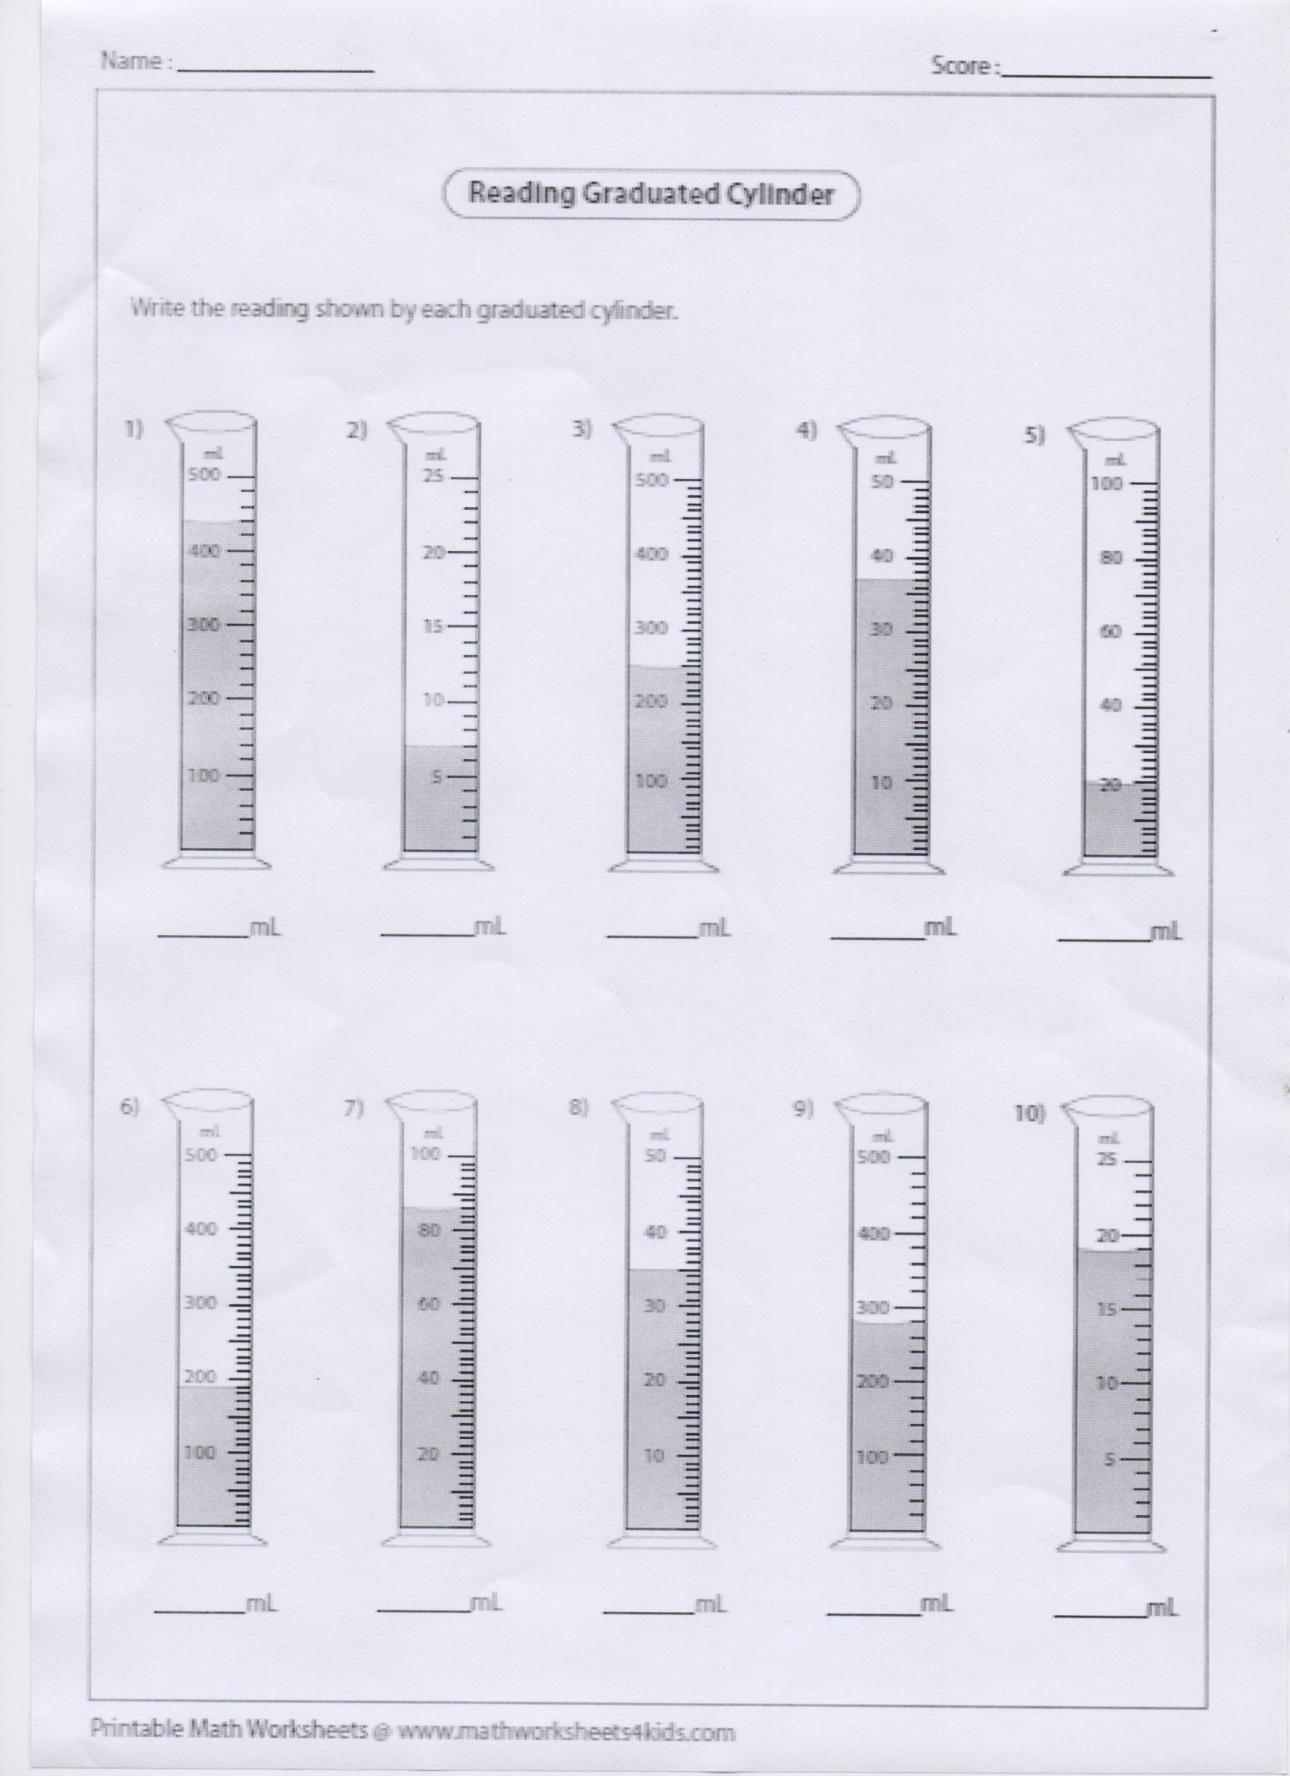 Math Blog Worksheet Class 4 Pg 2 Math Blog Worksheets Educational Worksheets